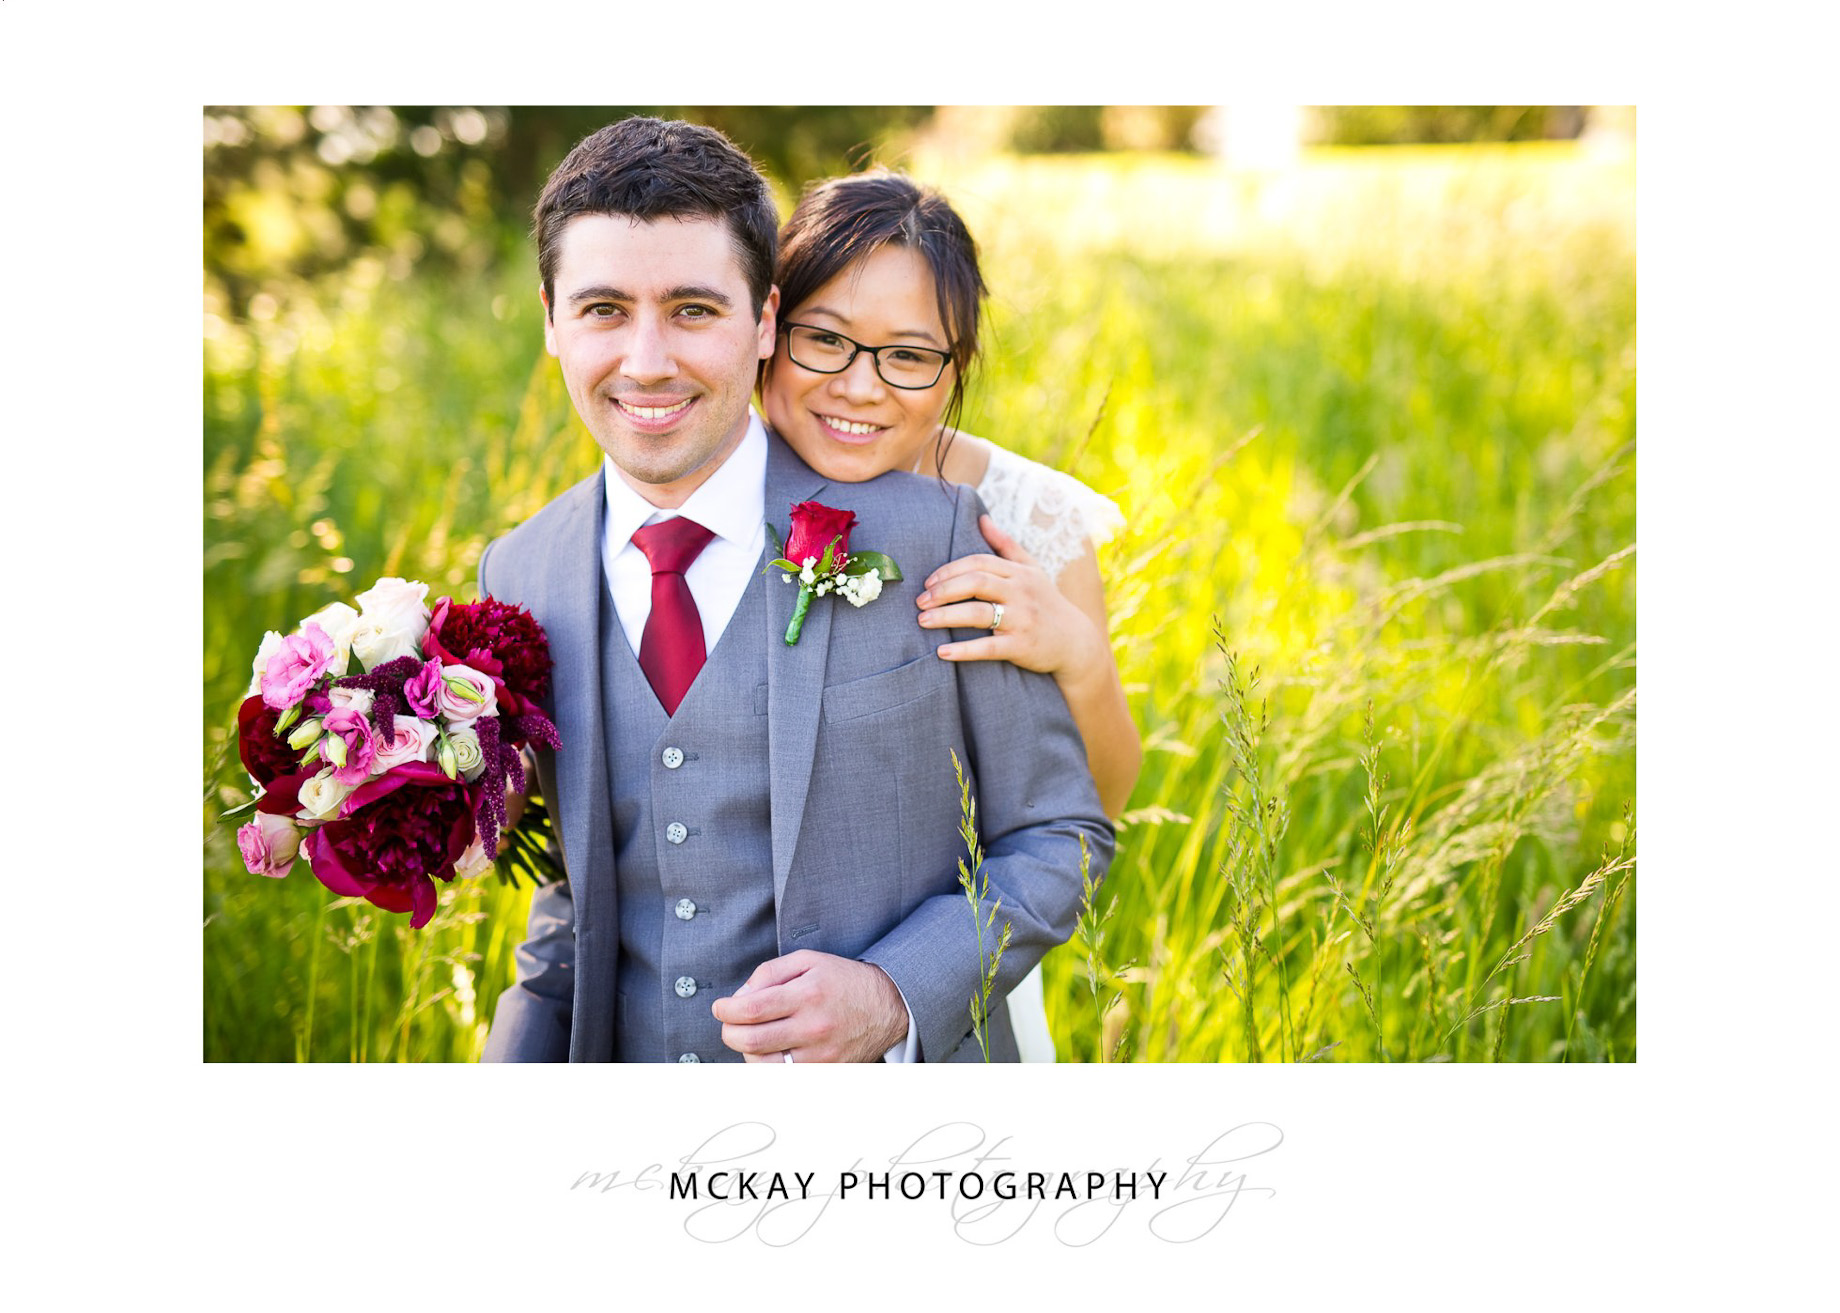 Wedding colour at Briars photos in grass field